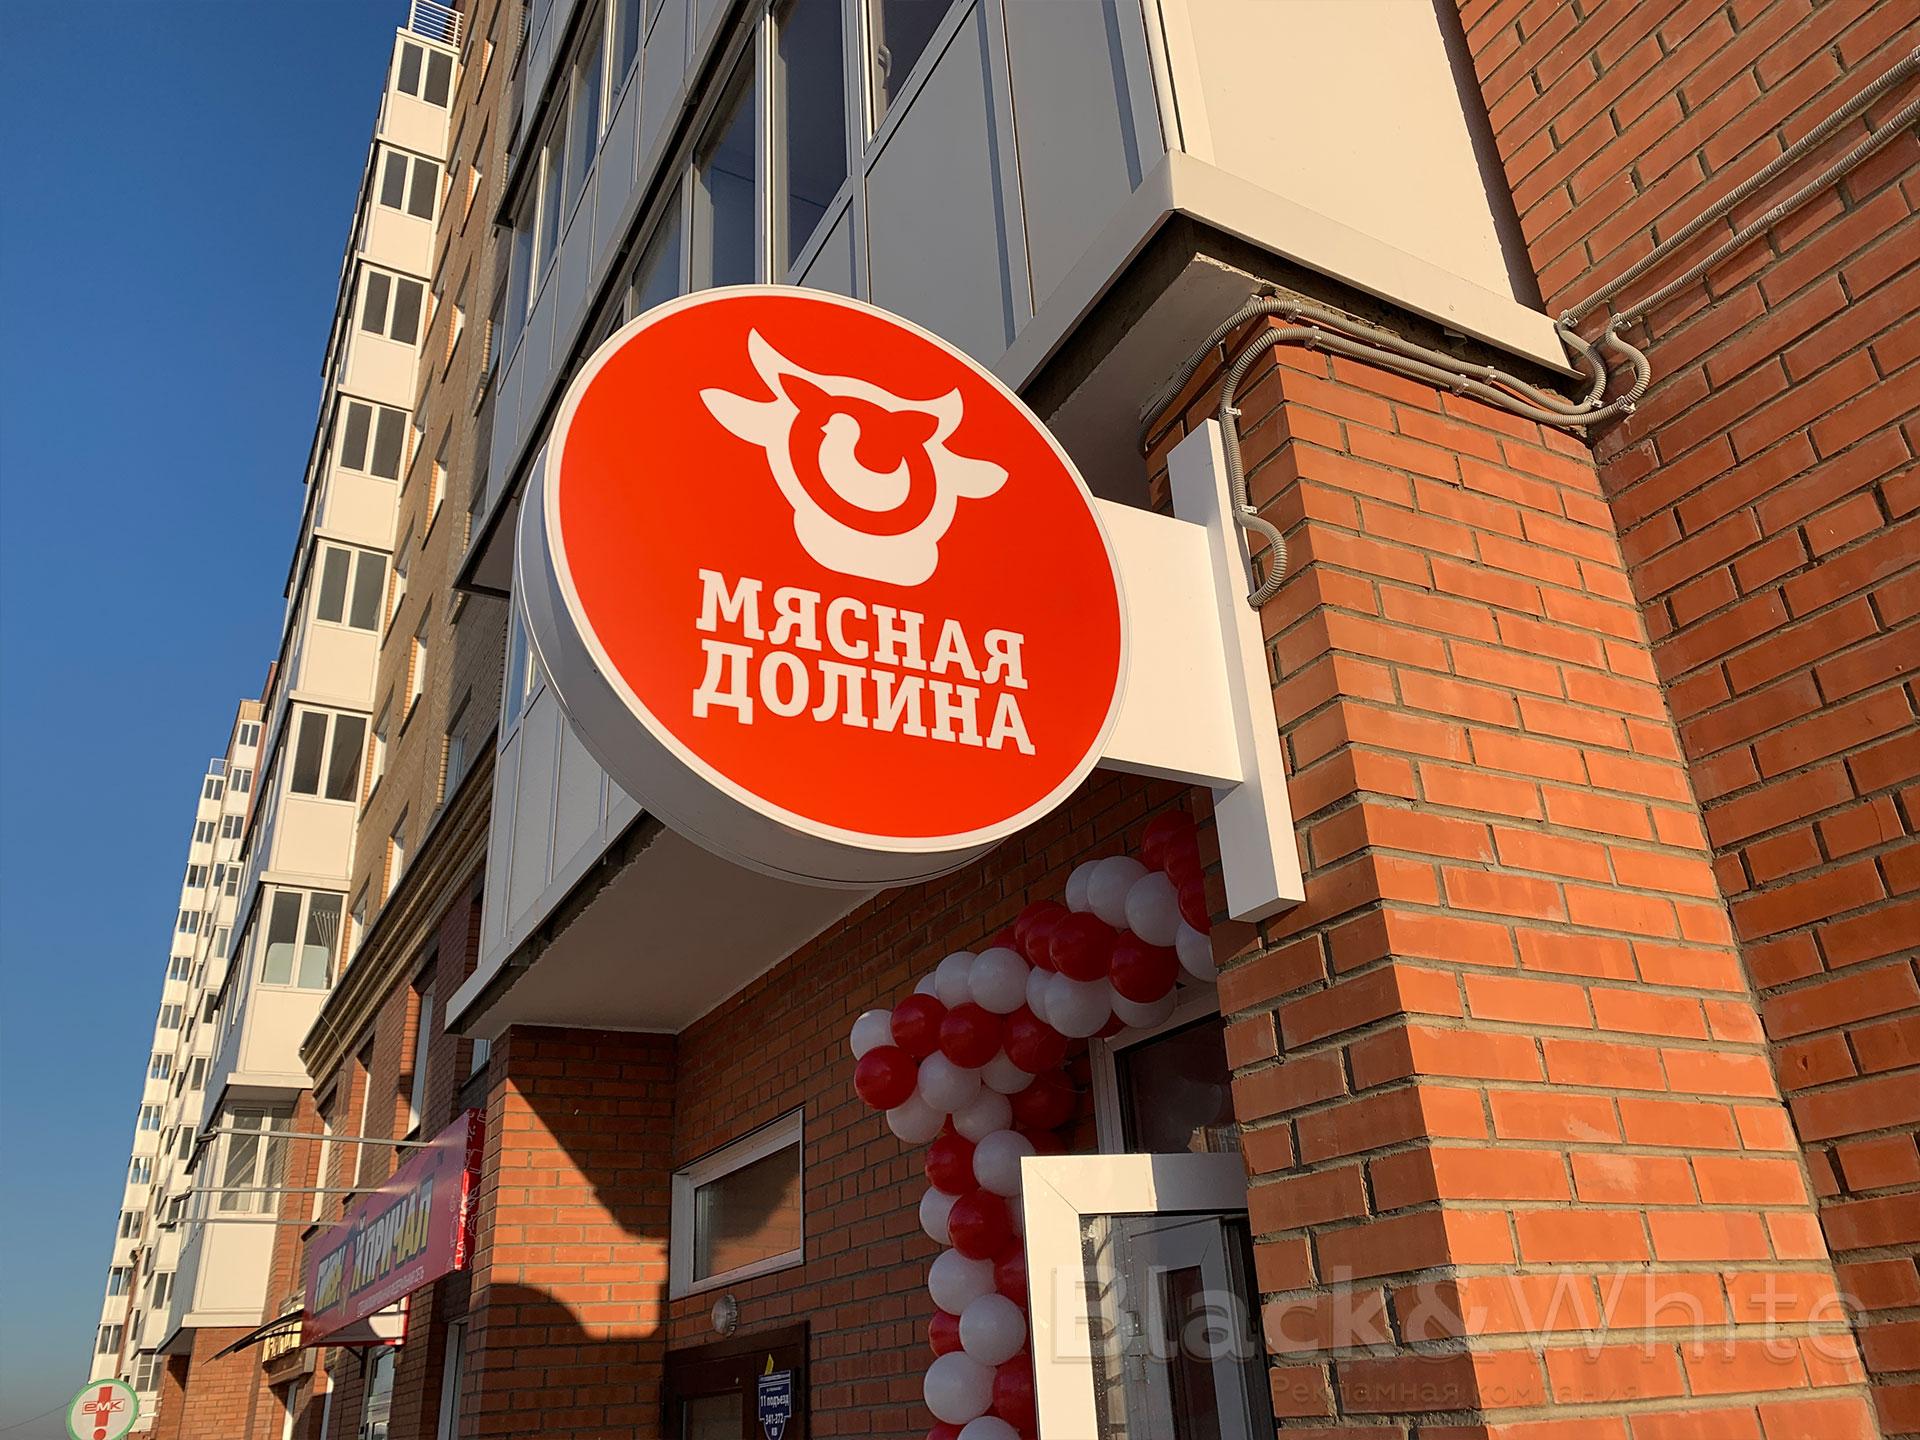 Изготовление-панели-кронштейн-Красноярск.jpg